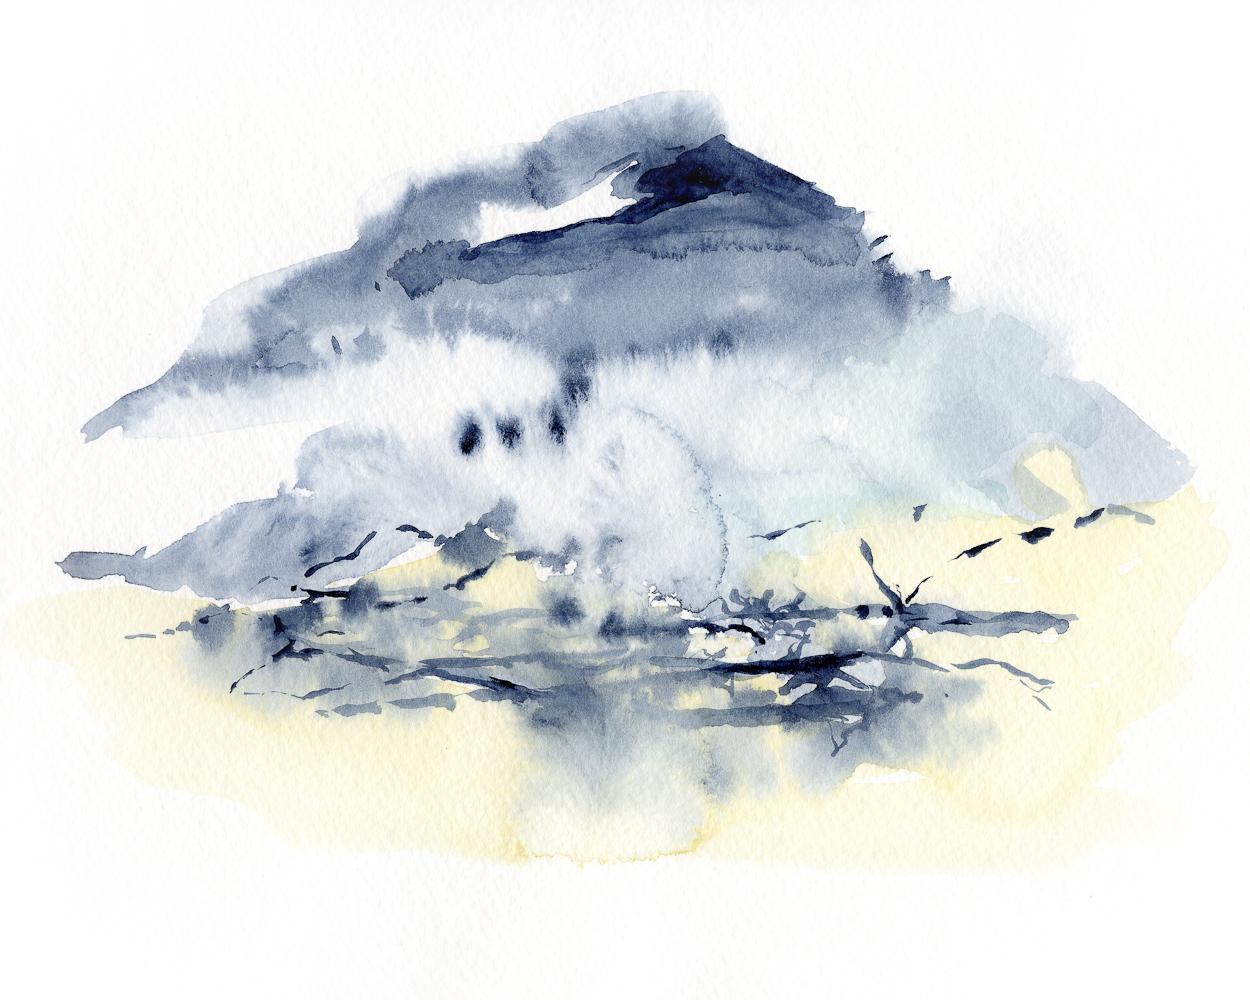 watercolor001.jpg